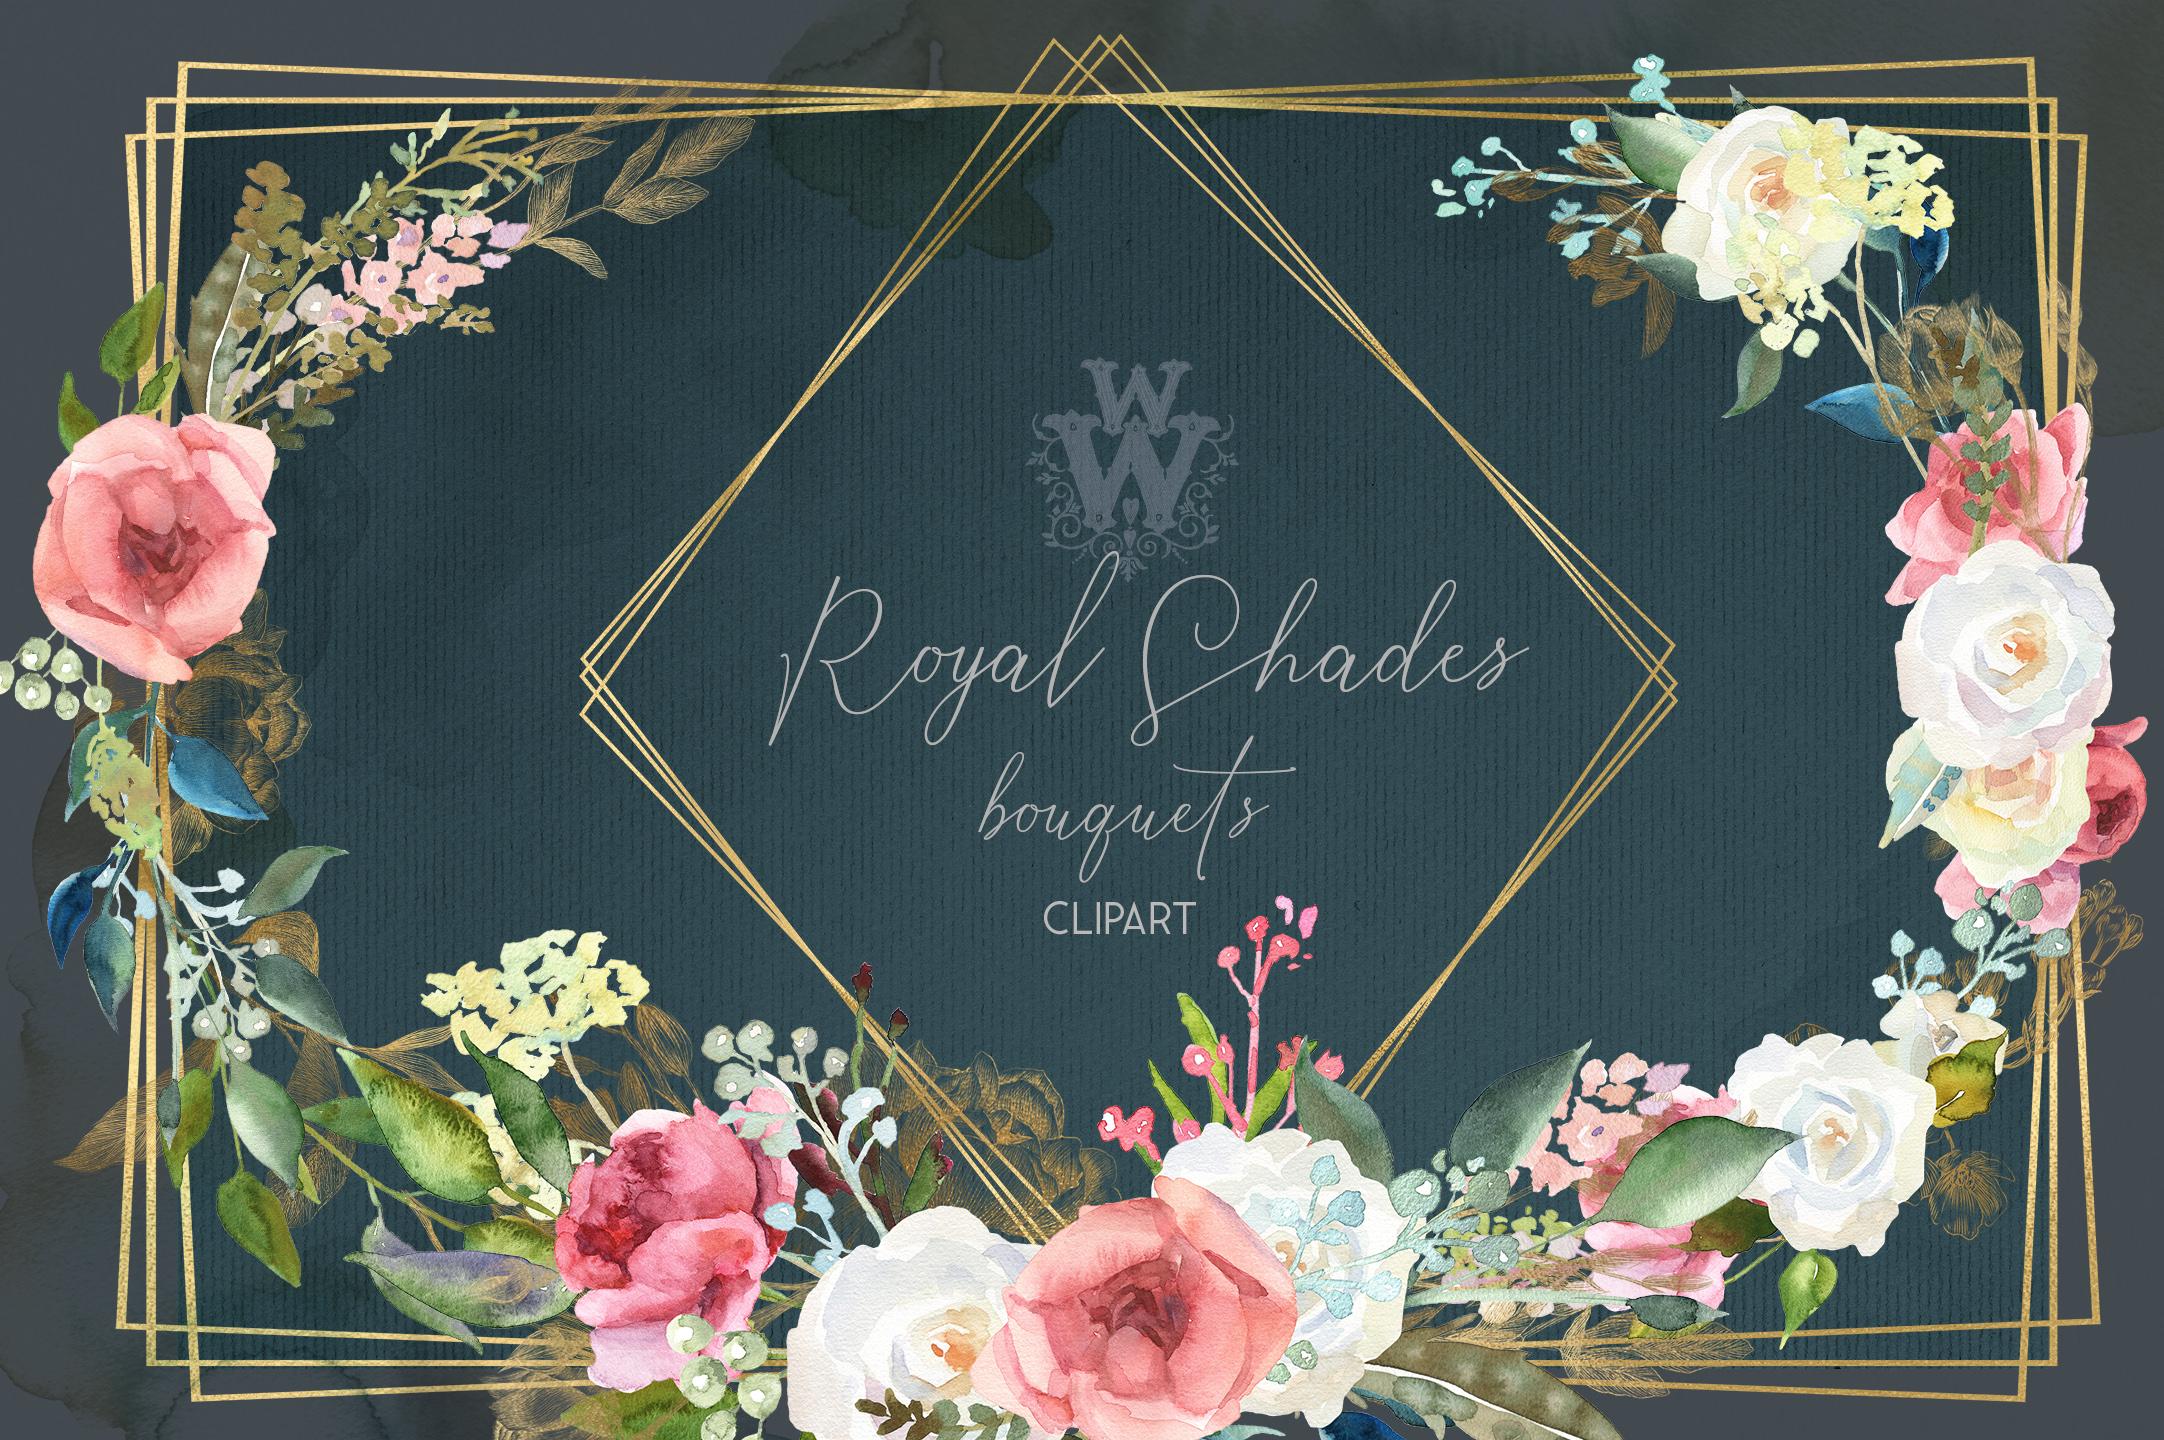 Watercolor rustic wedding bouquets clipart, vintage wreath example image 9